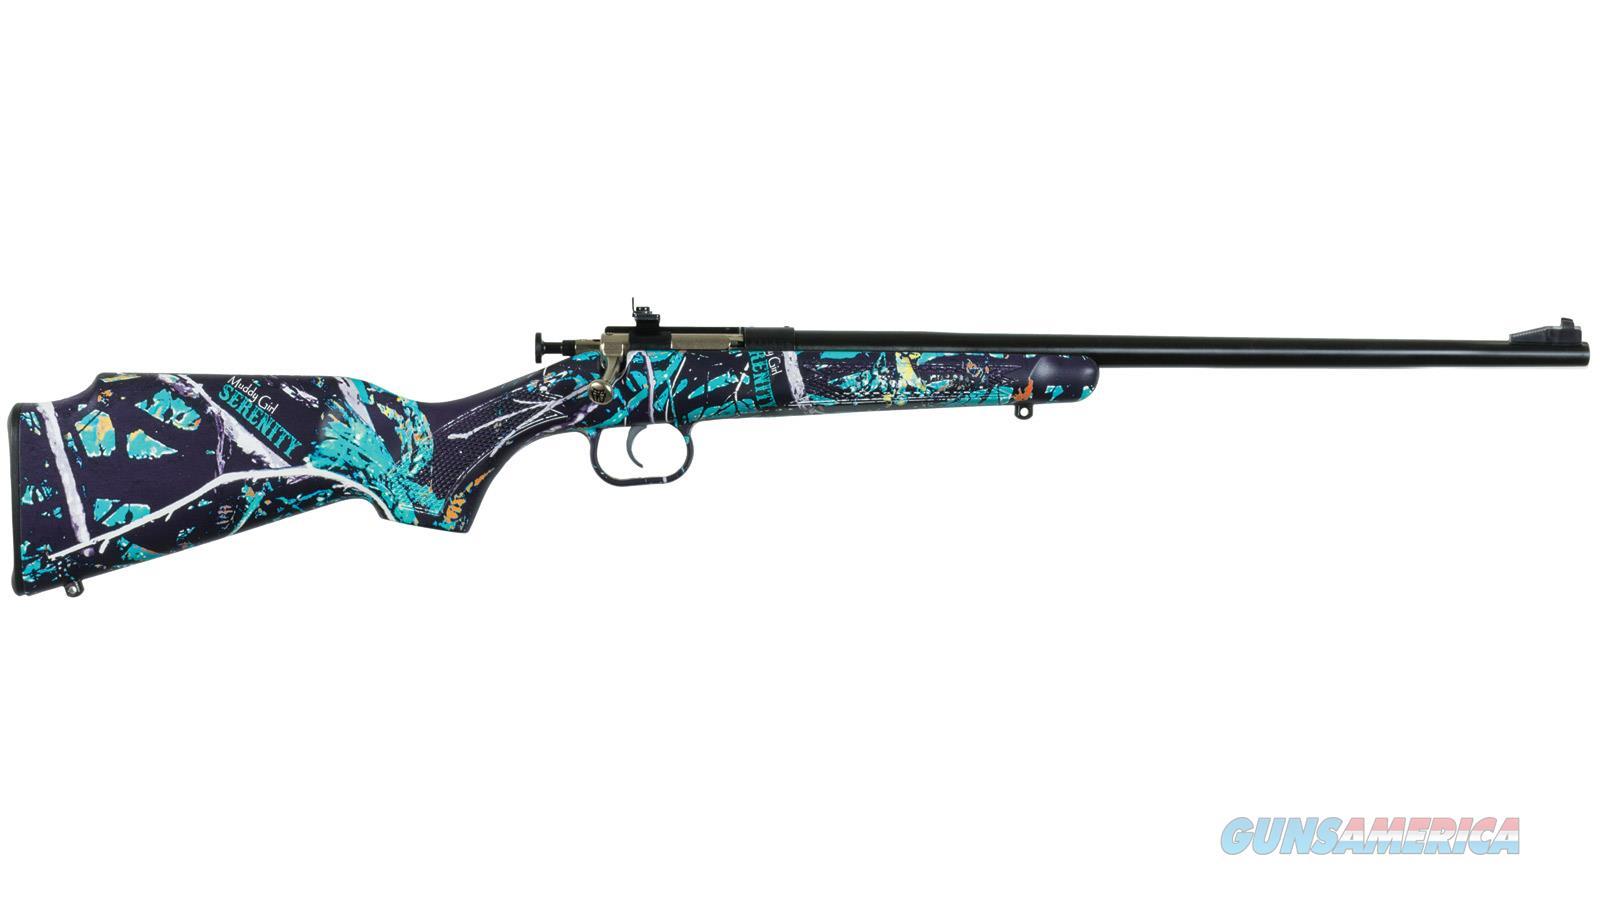 Keystone Sporting Arms Crkt Mdy Grl Serenity 22Lr KSA2172  Guns > Rifles > K Misc Rifles